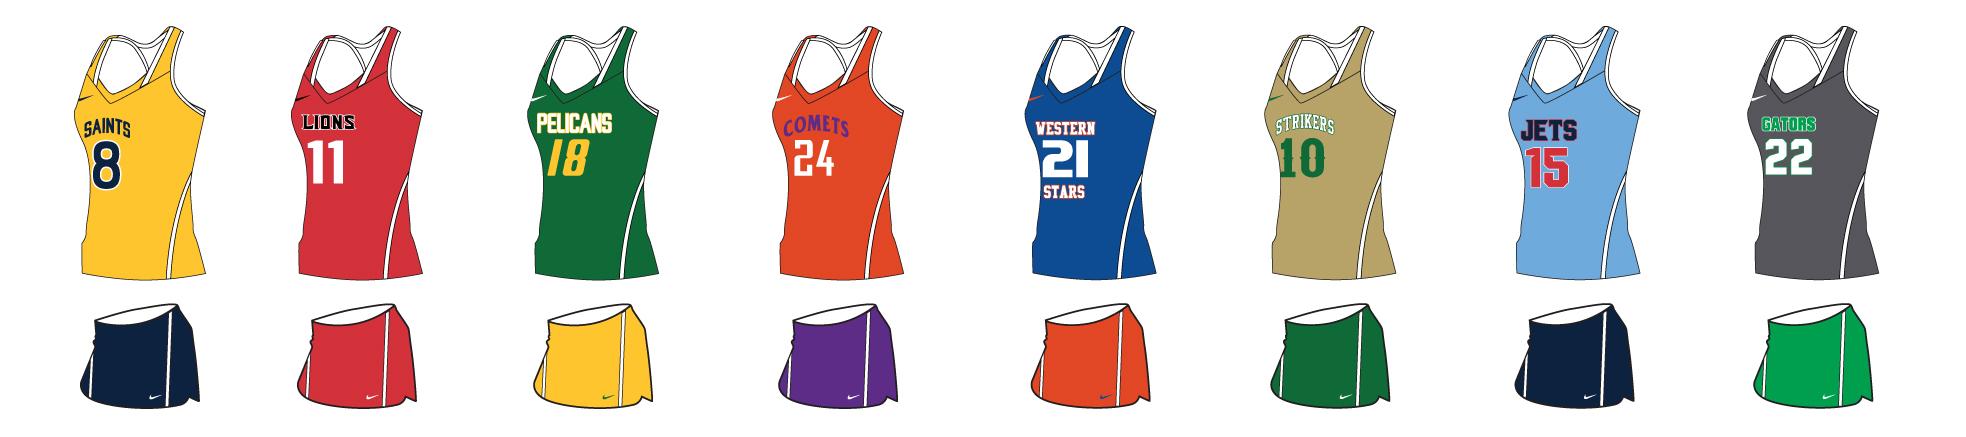 custom-nike-womens-fastbreak-uniforms.jpg